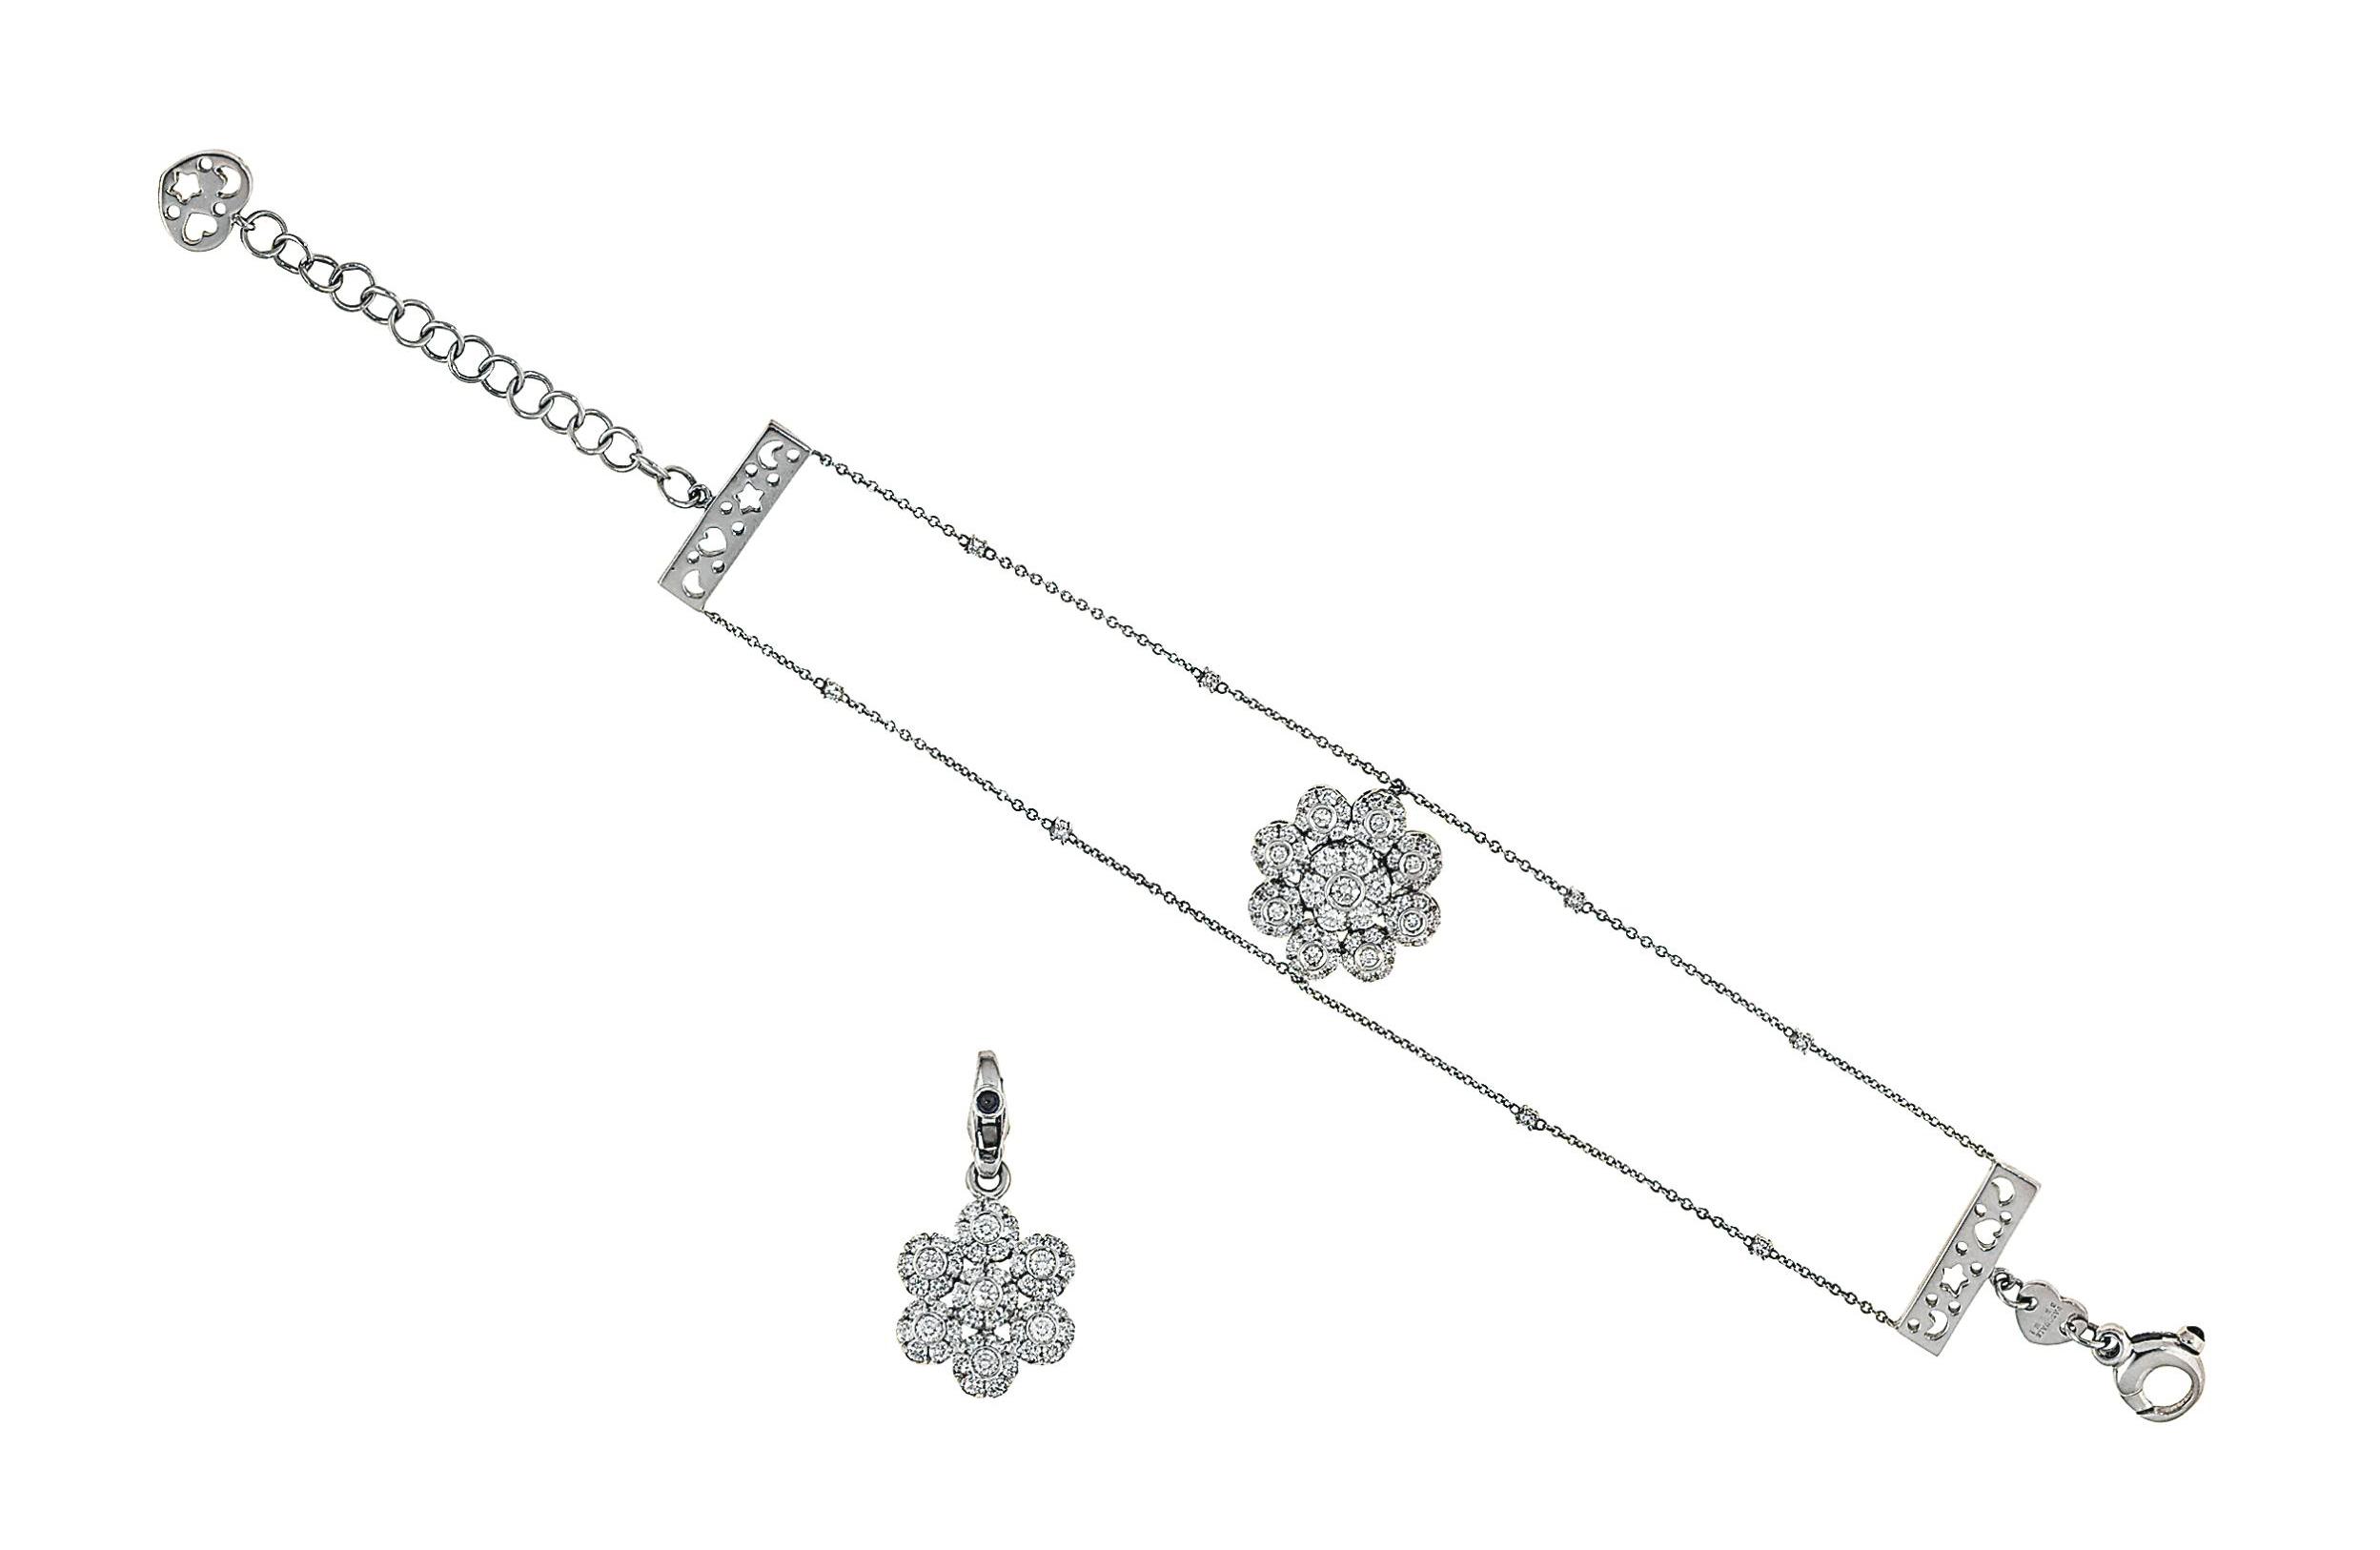 A diamond-set bracelet and pendant, by Pasquale Bruni